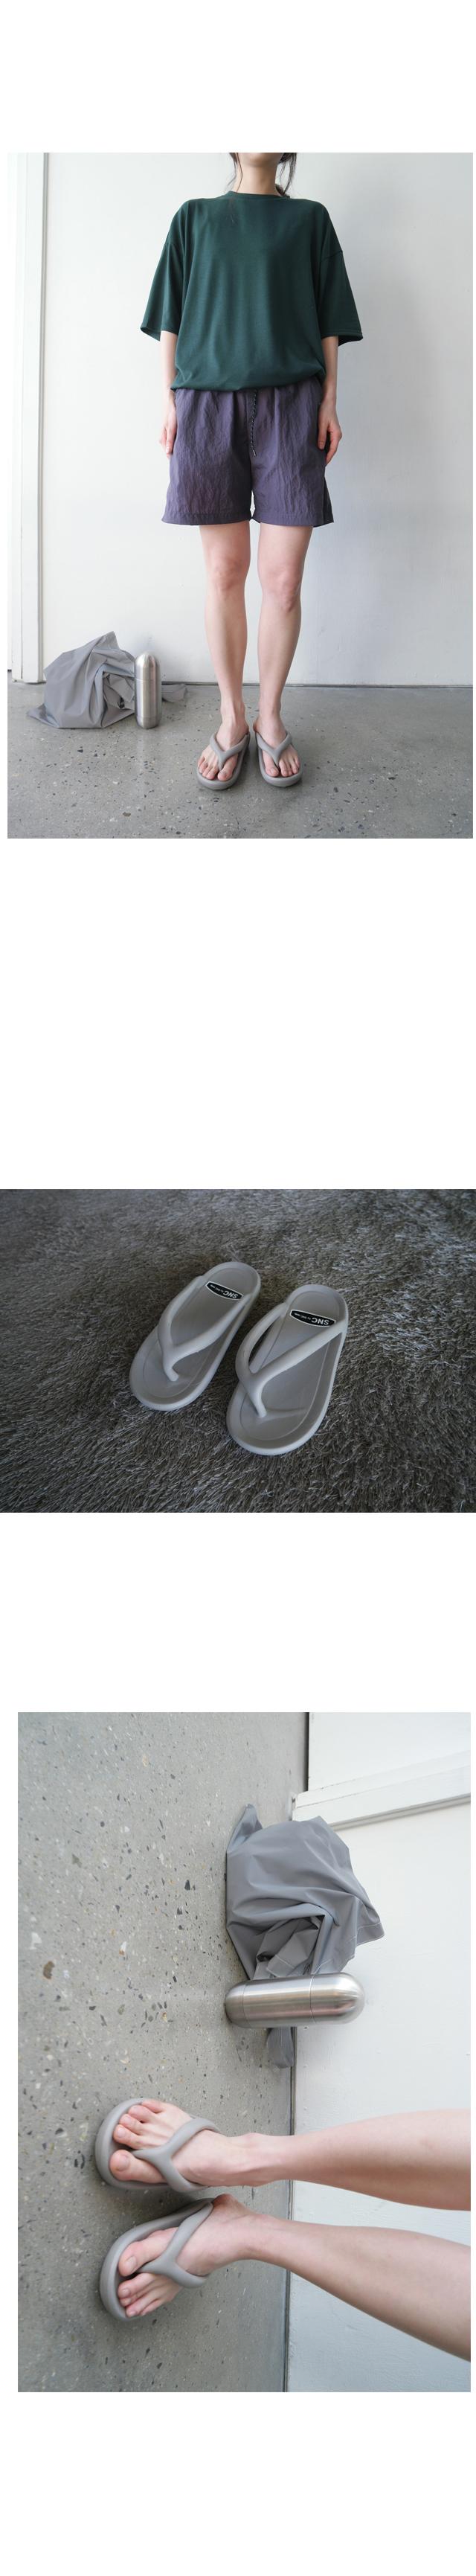 inflate detail flip flops